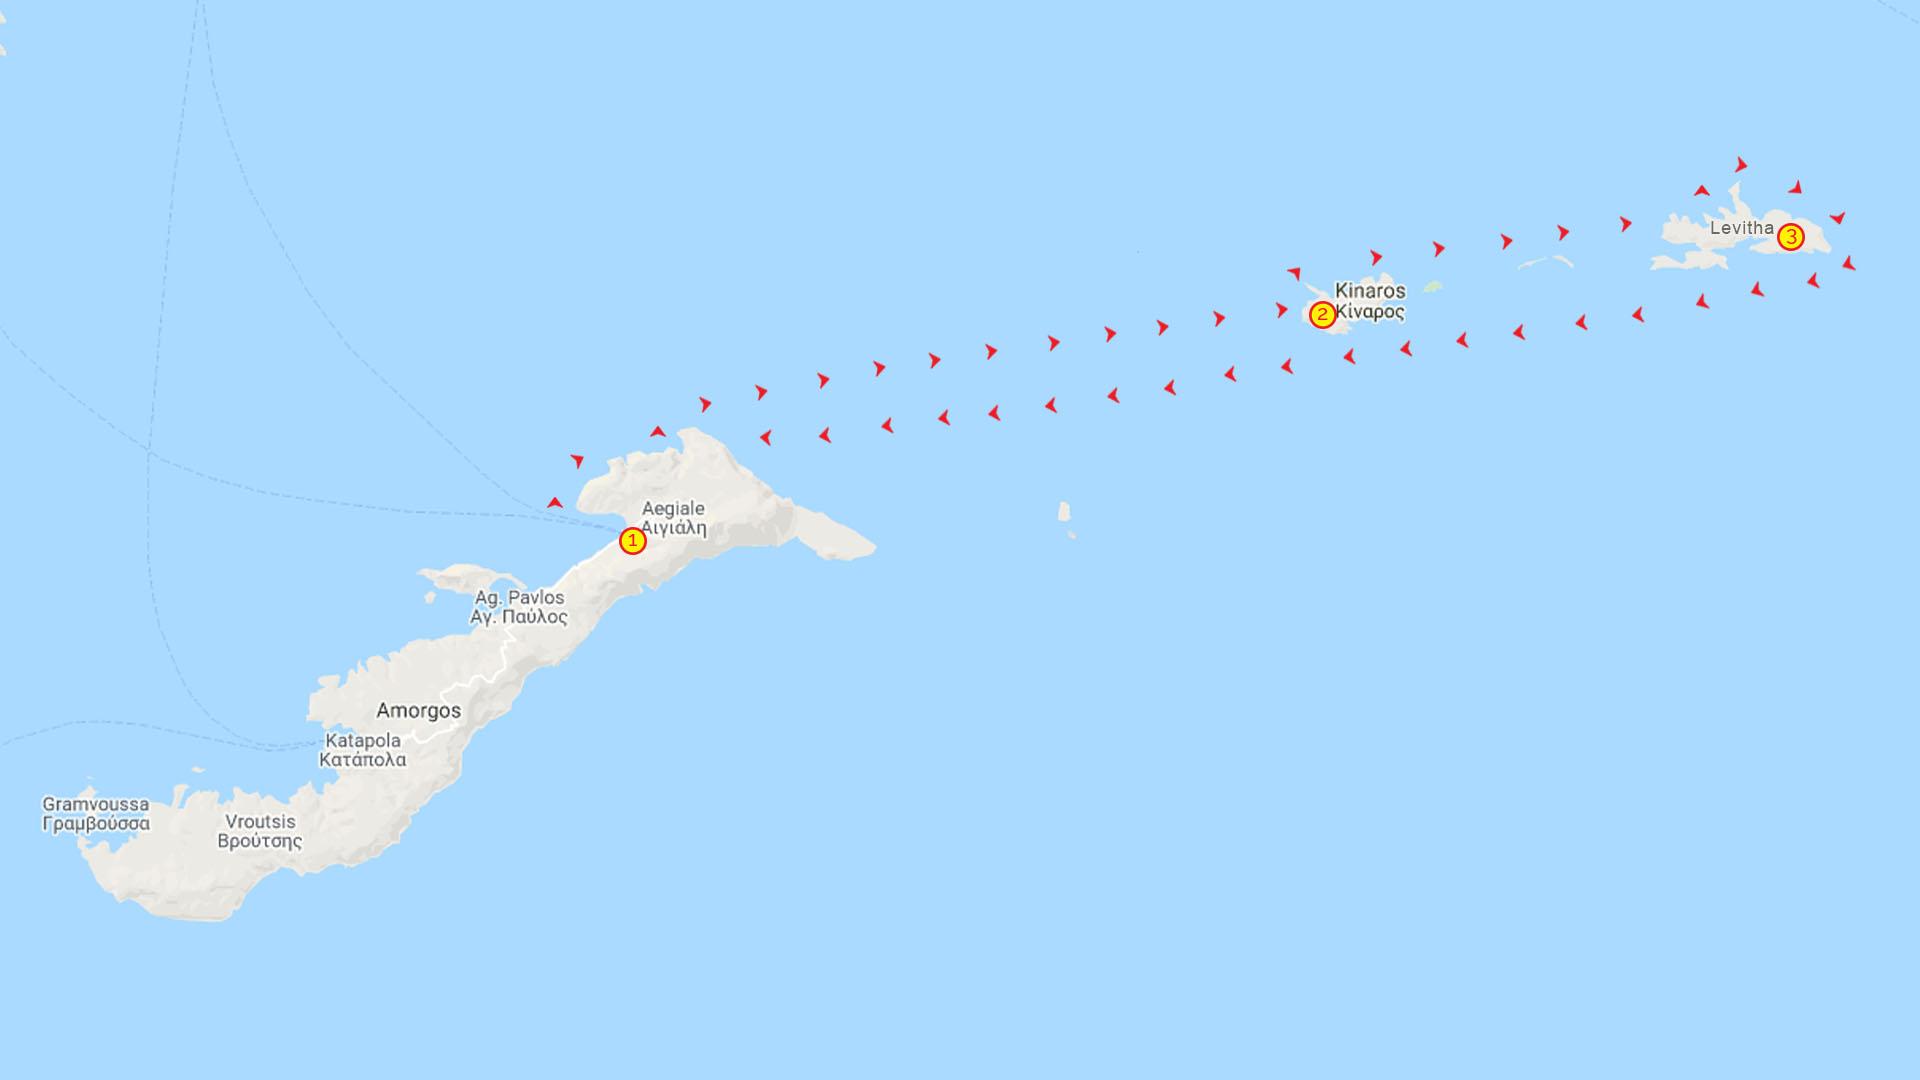 Day Cruise Kinaros & Levitha Map